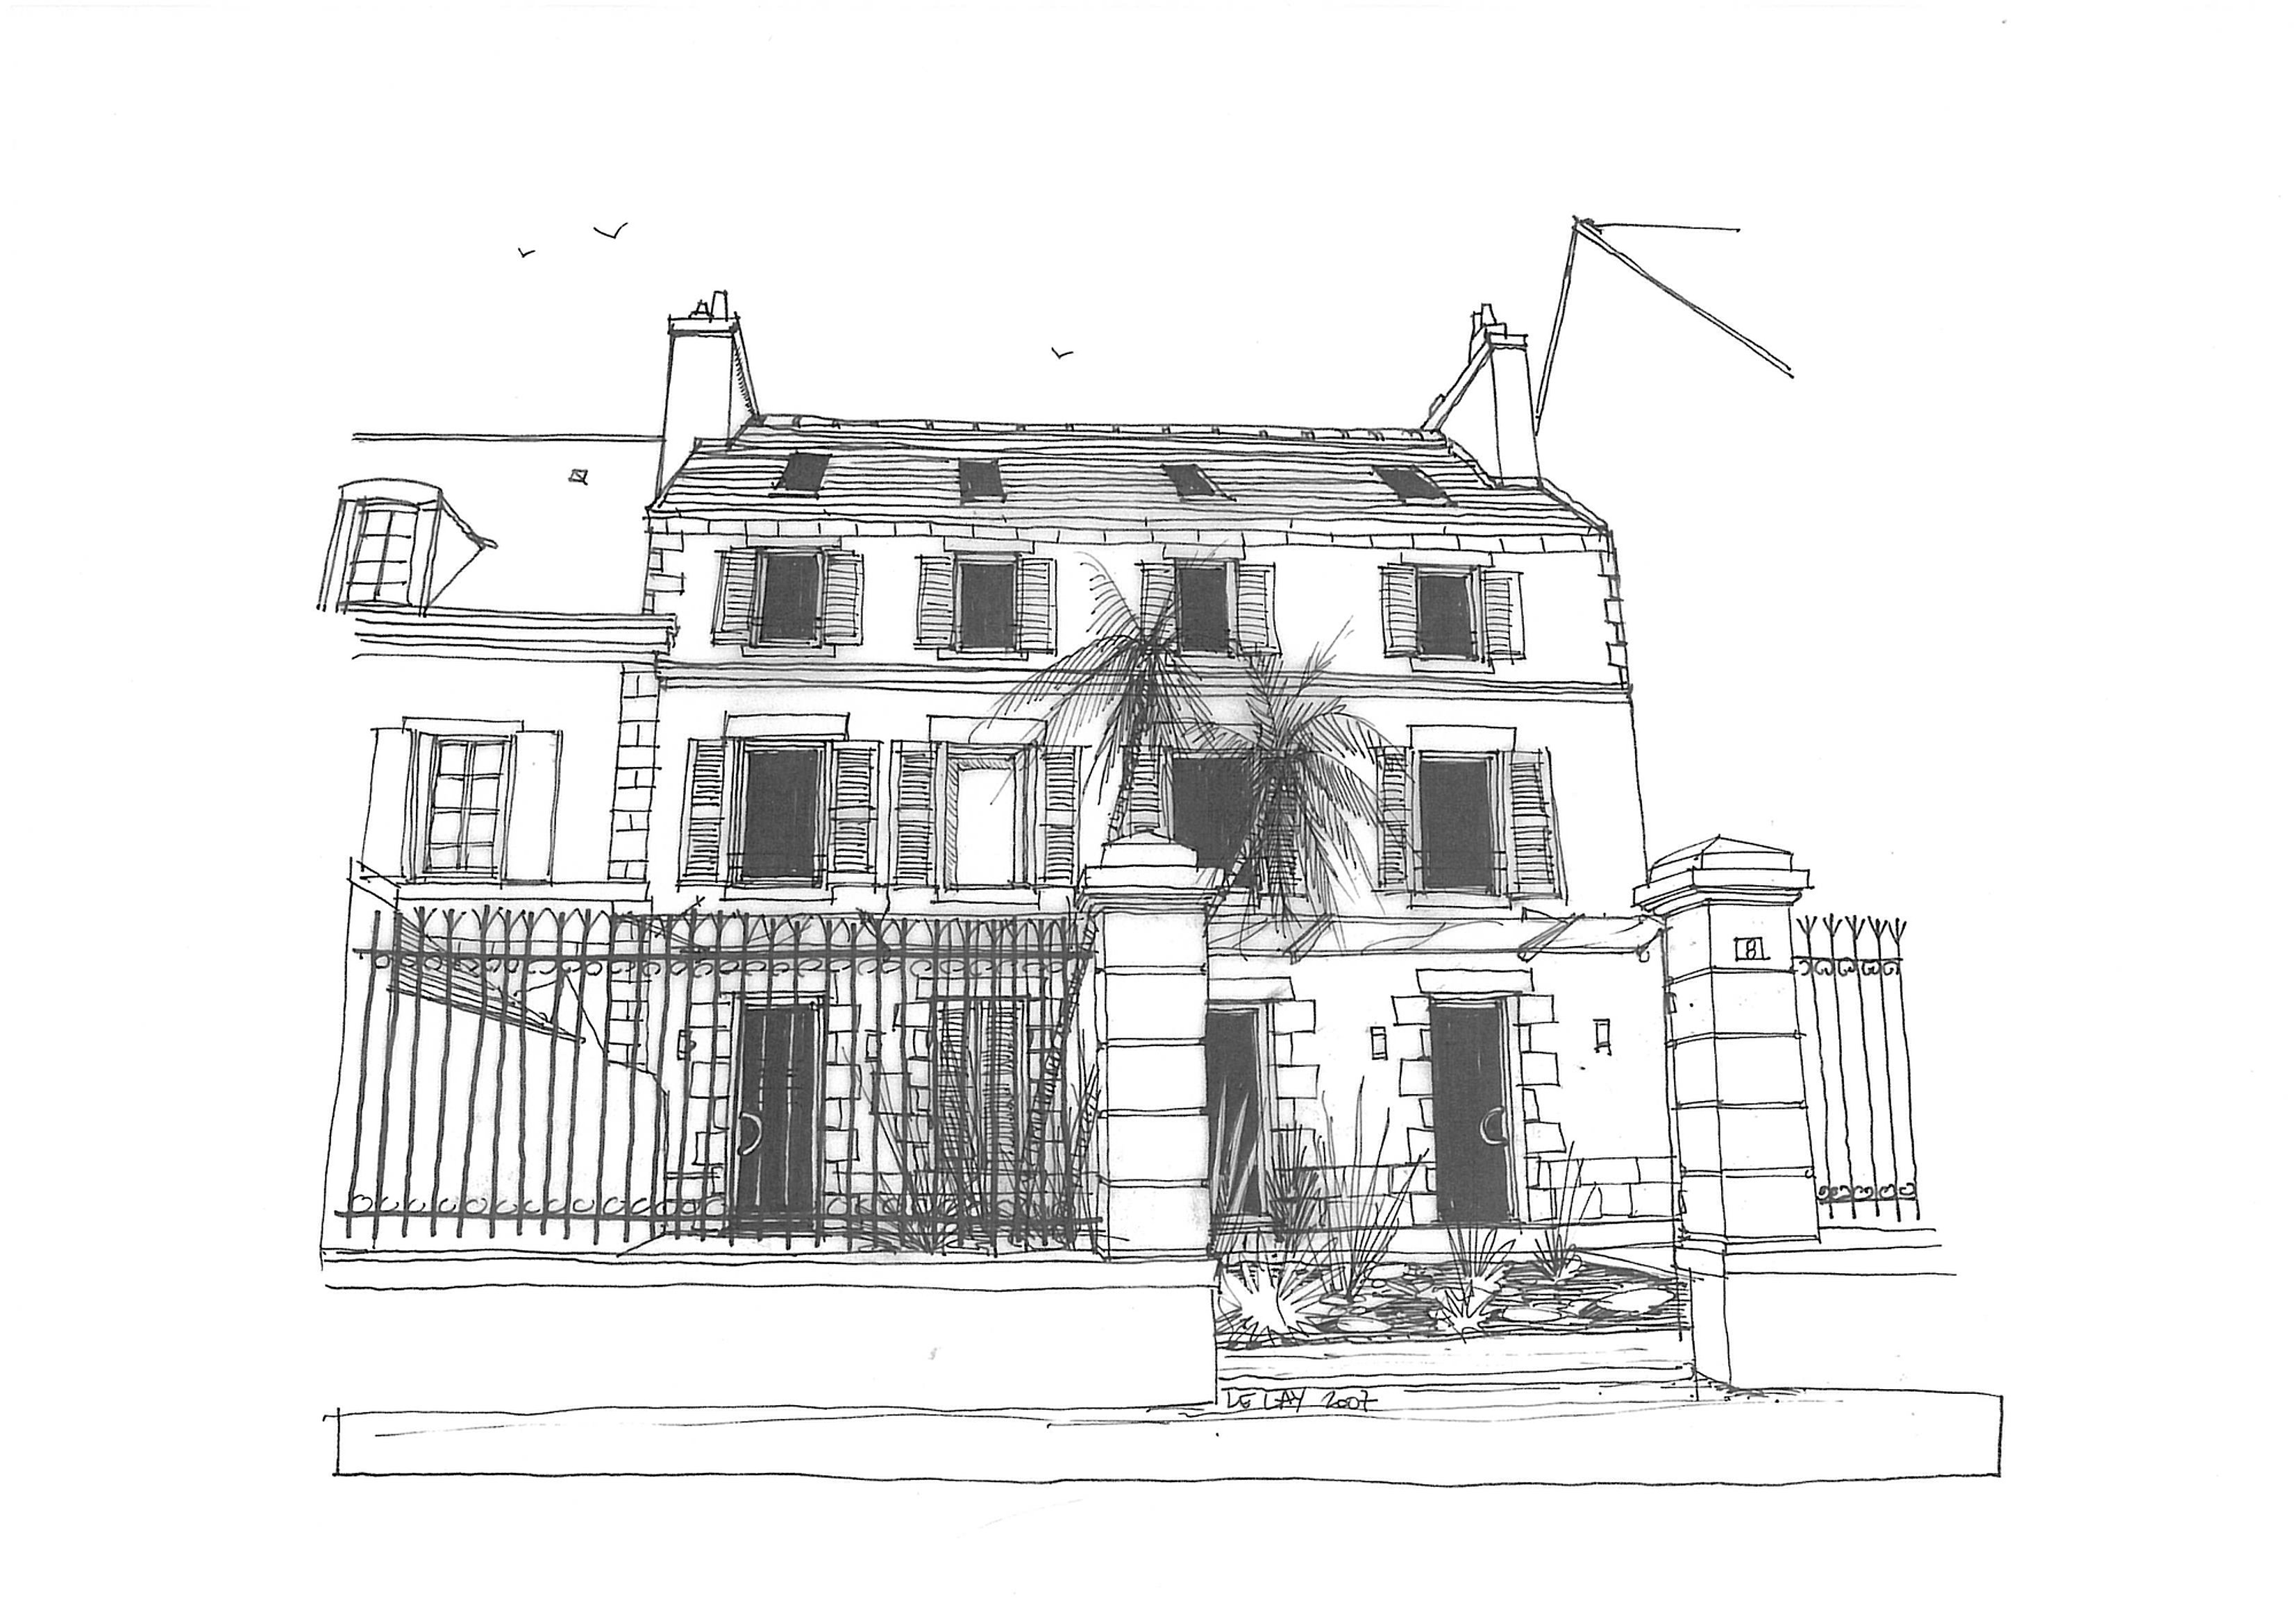 jean charles le lay home designer architecte d 39 int rieur quimper architecte int rieur quimper. Black Bedroom Furniture Sets. Home Design Ideas